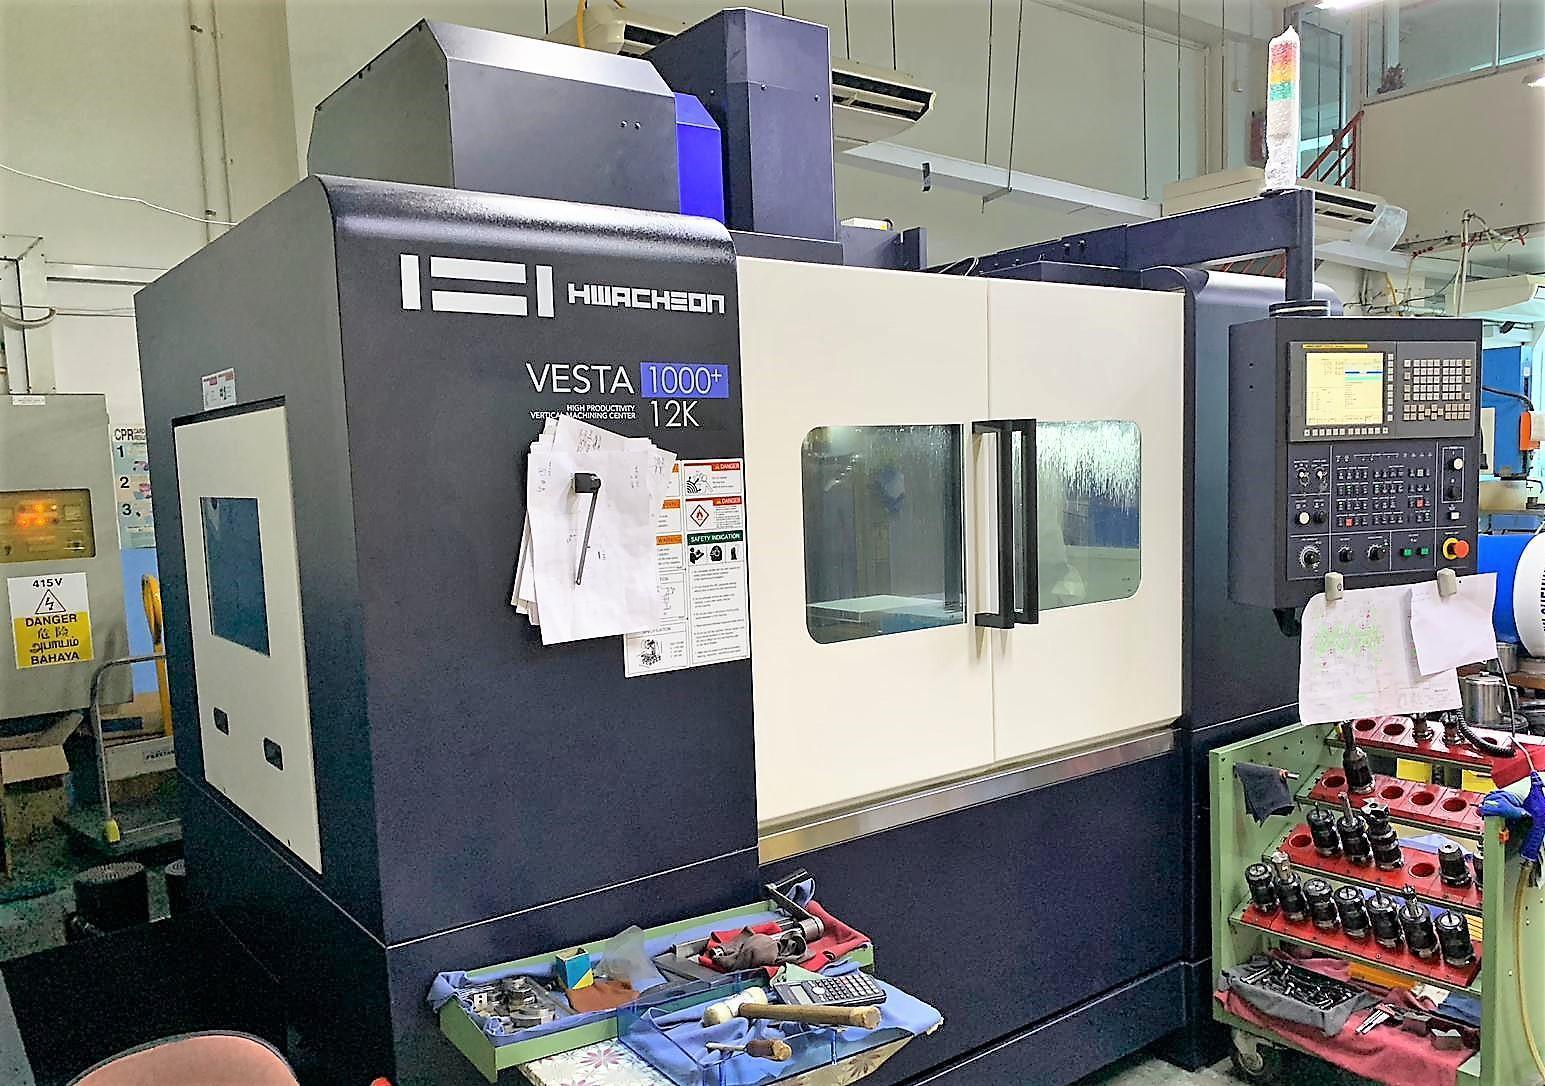 HWACHEON VESTA 1000+ CNC 3-AXIS VERTICAL MACHINING CENTER